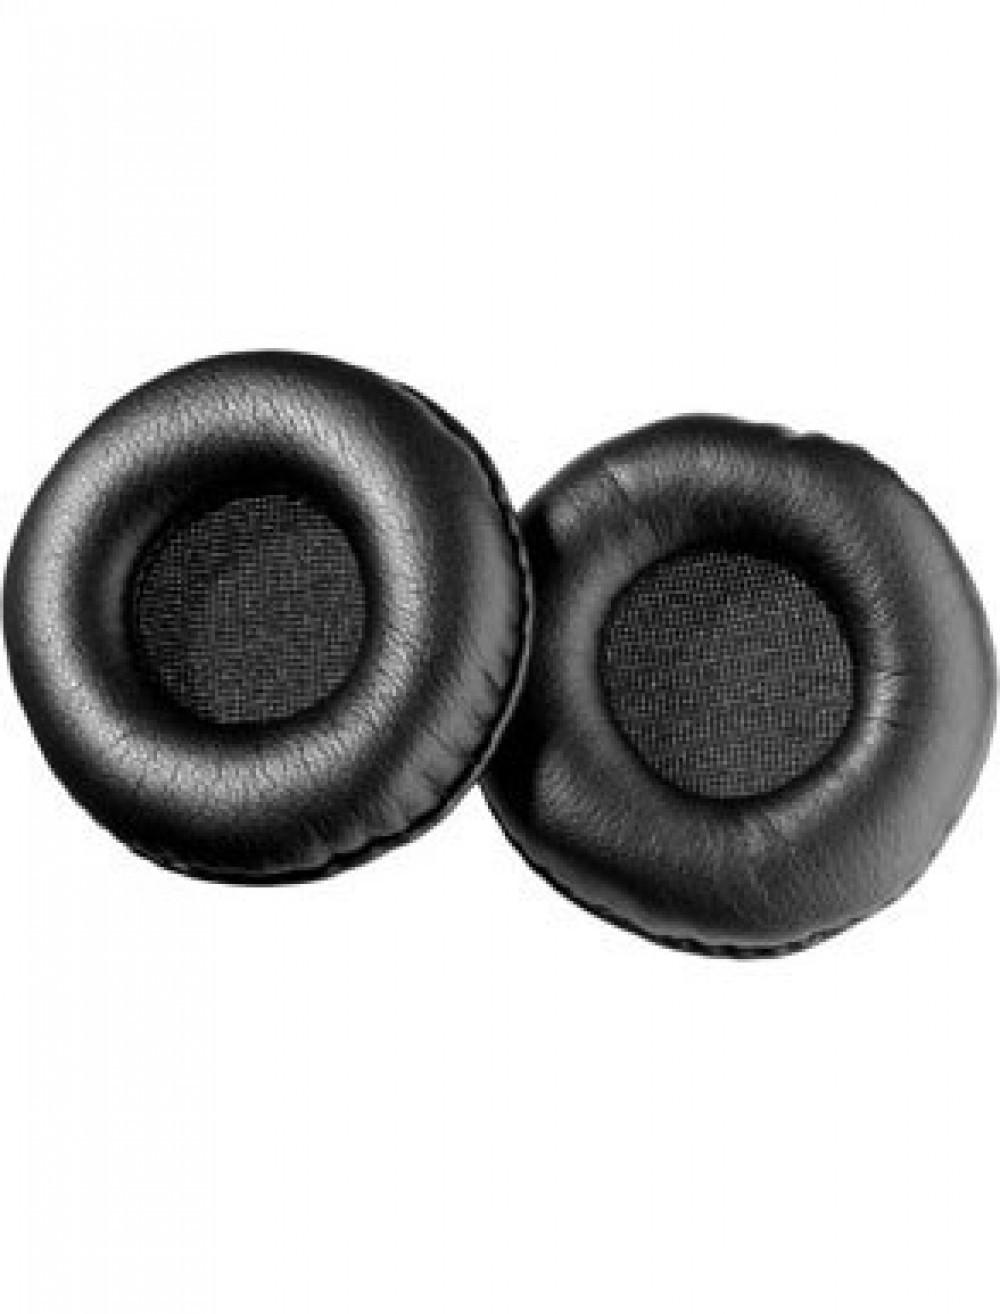 Sennheiser HZP 20 Large Leatherette Ear Pad (PK2)